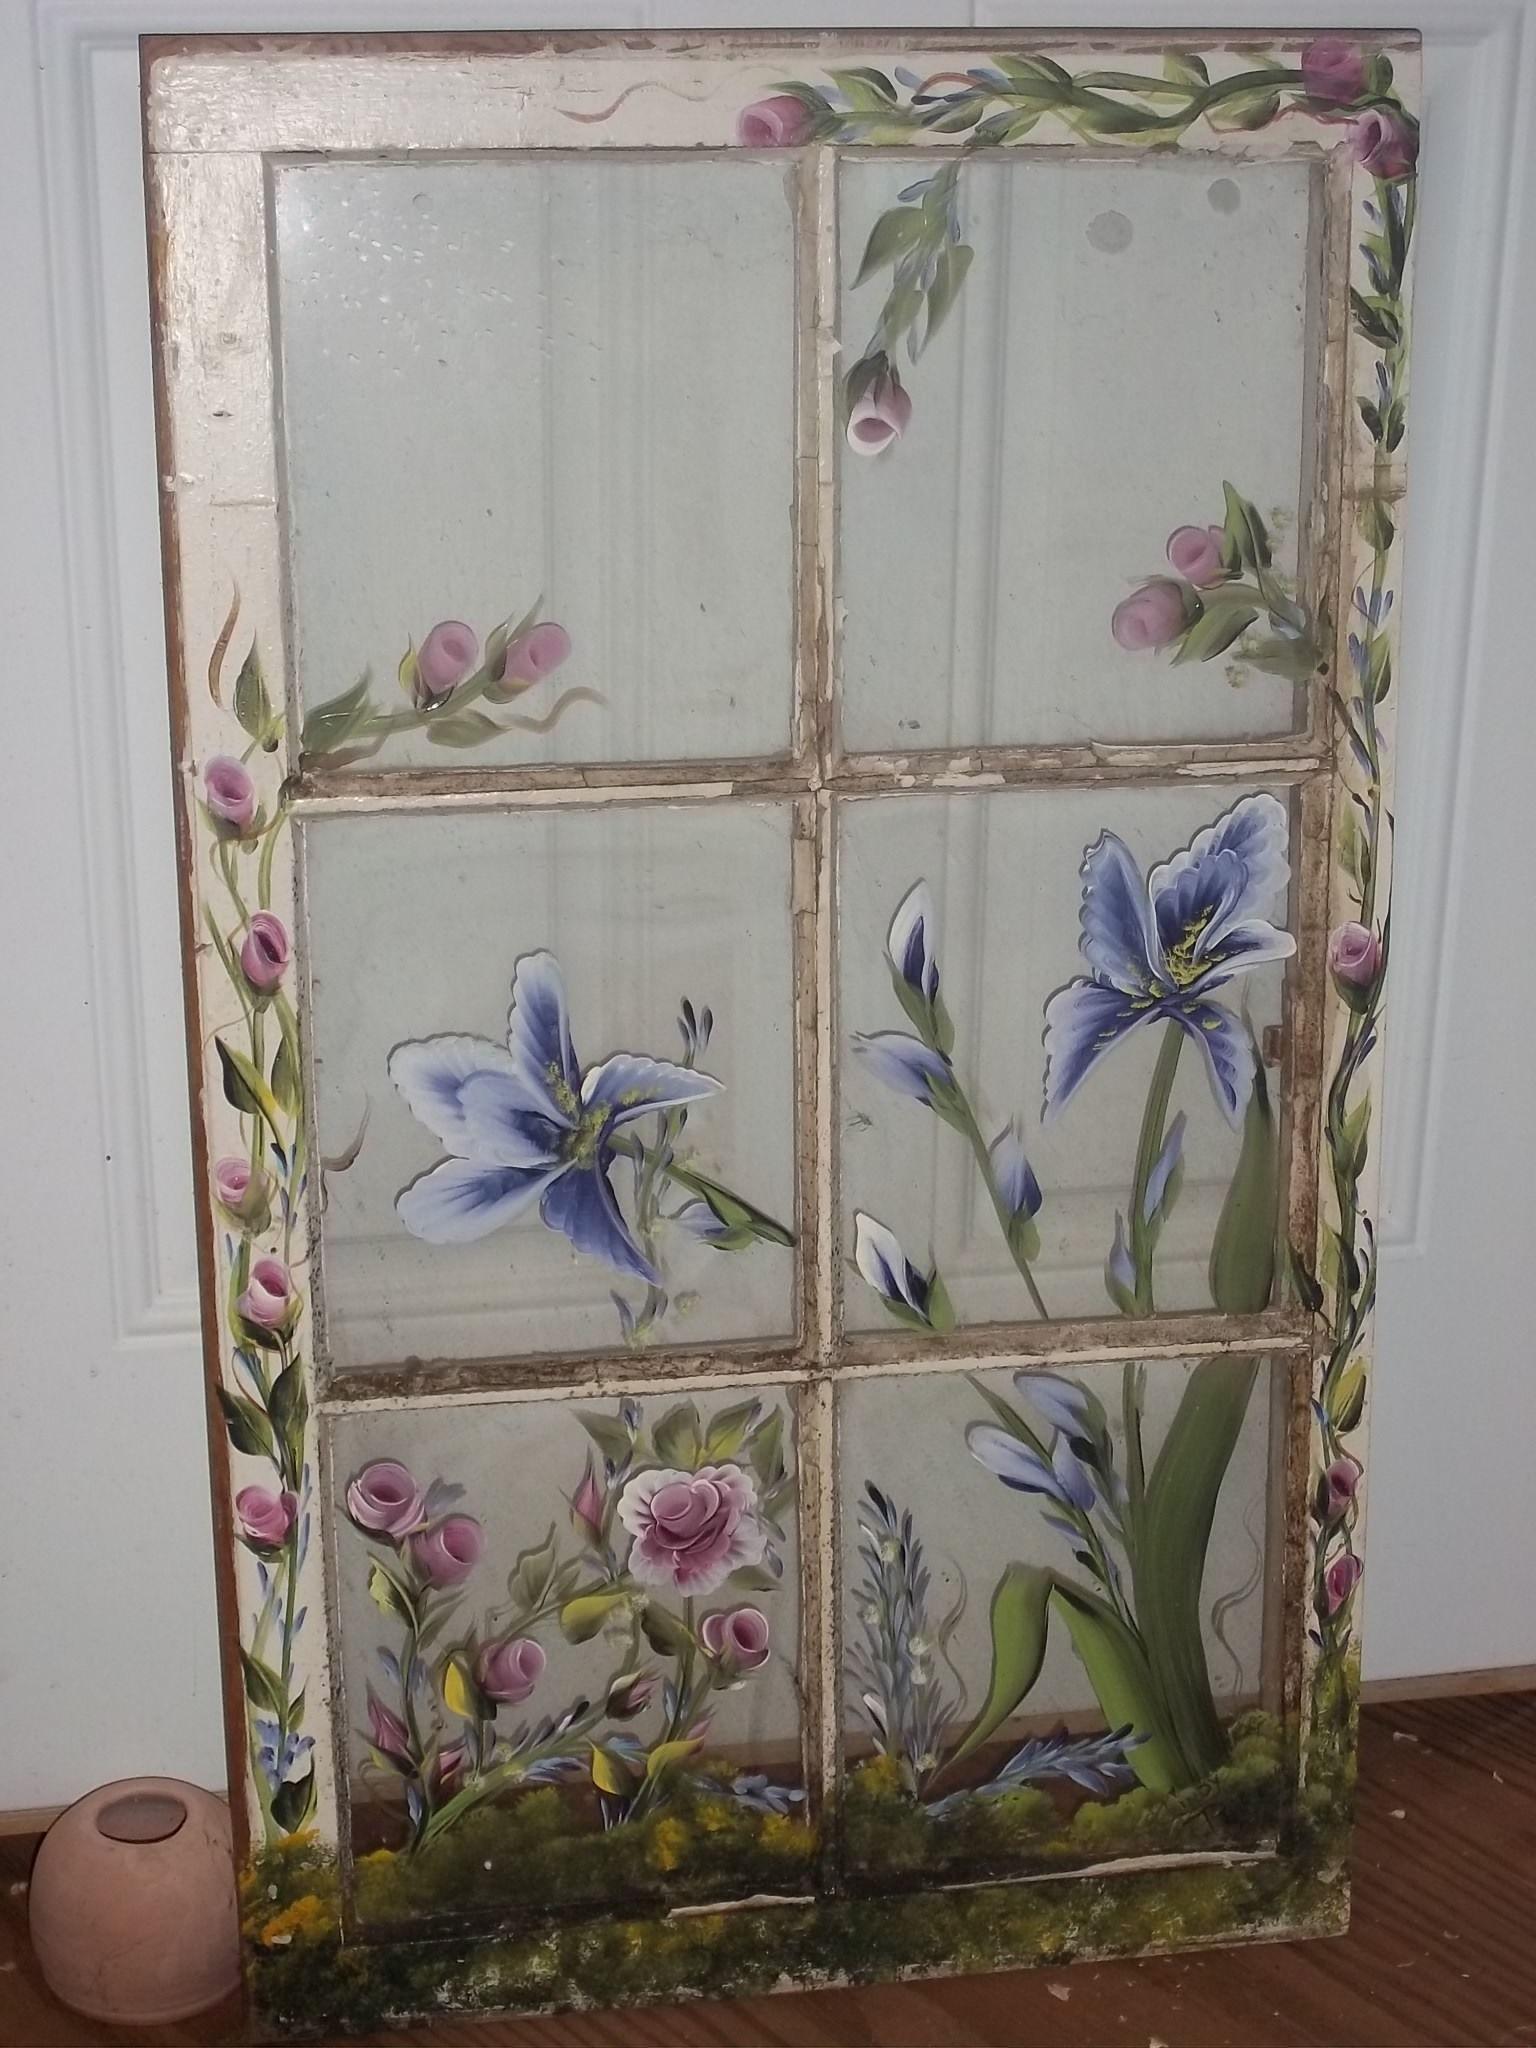 Painted Window Flowers   Upcycling   Old windows, Window pane art ...